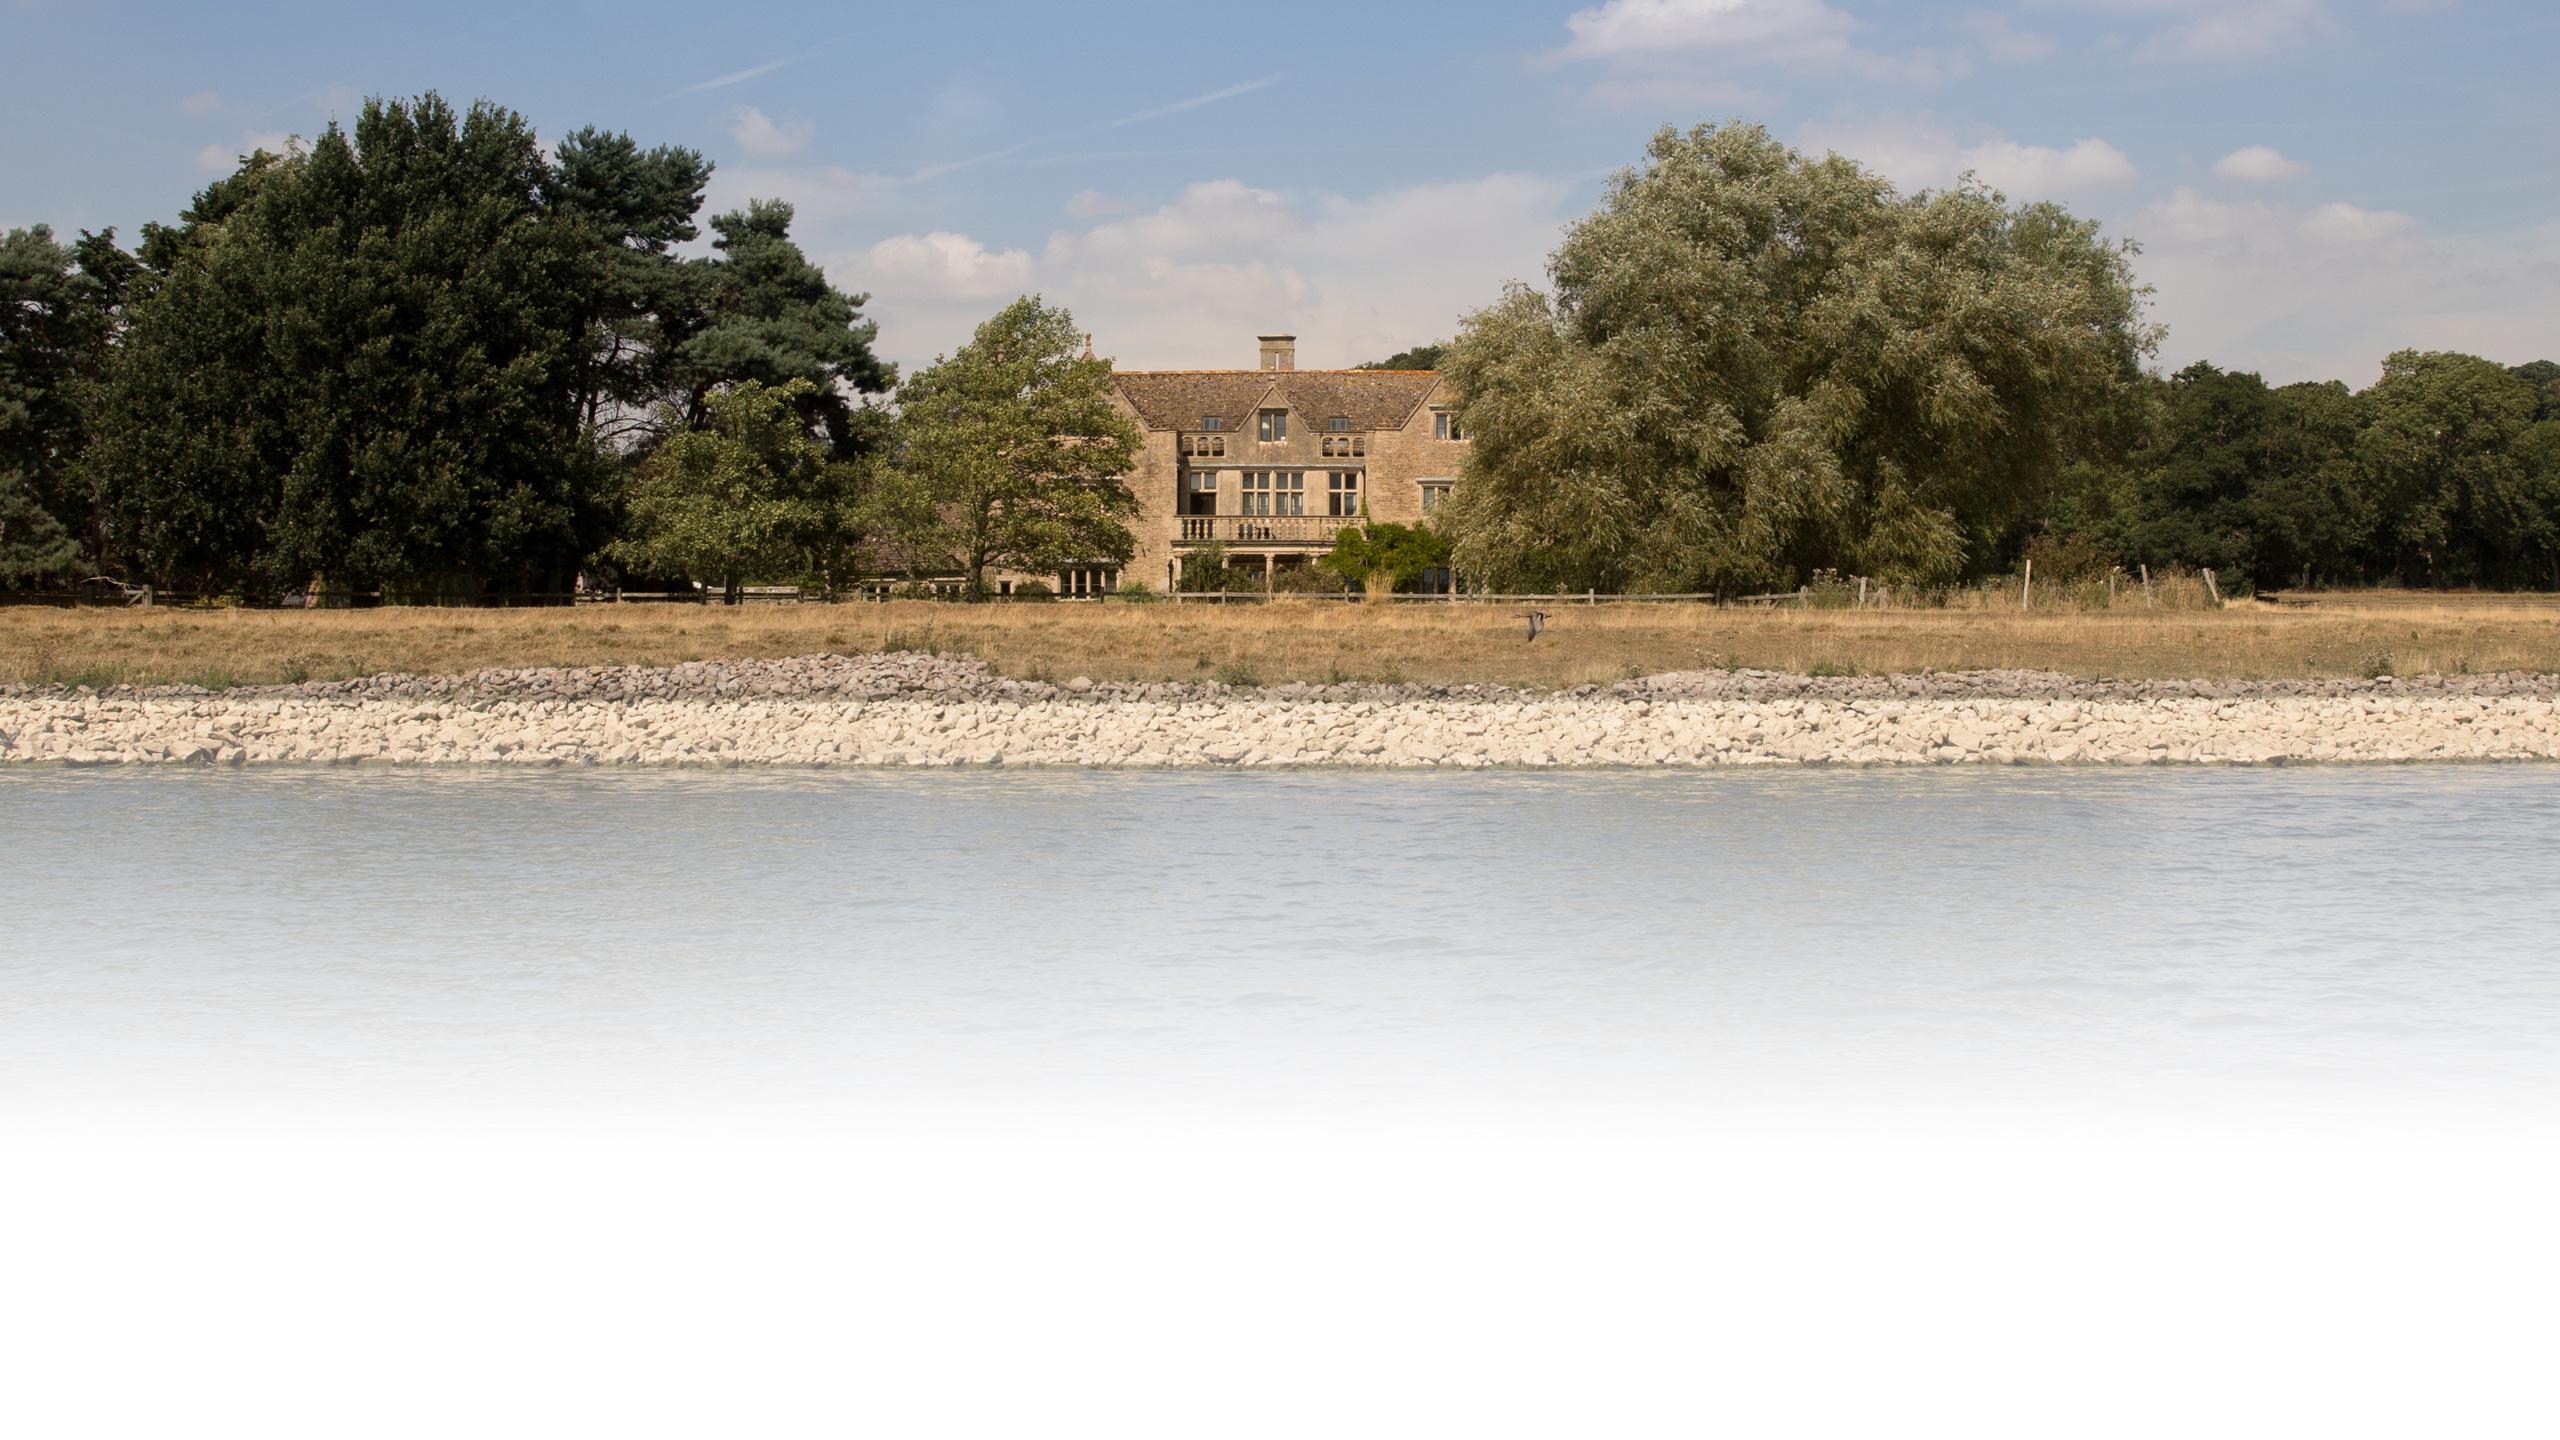 The Old Hall, Hambleton, Rutland